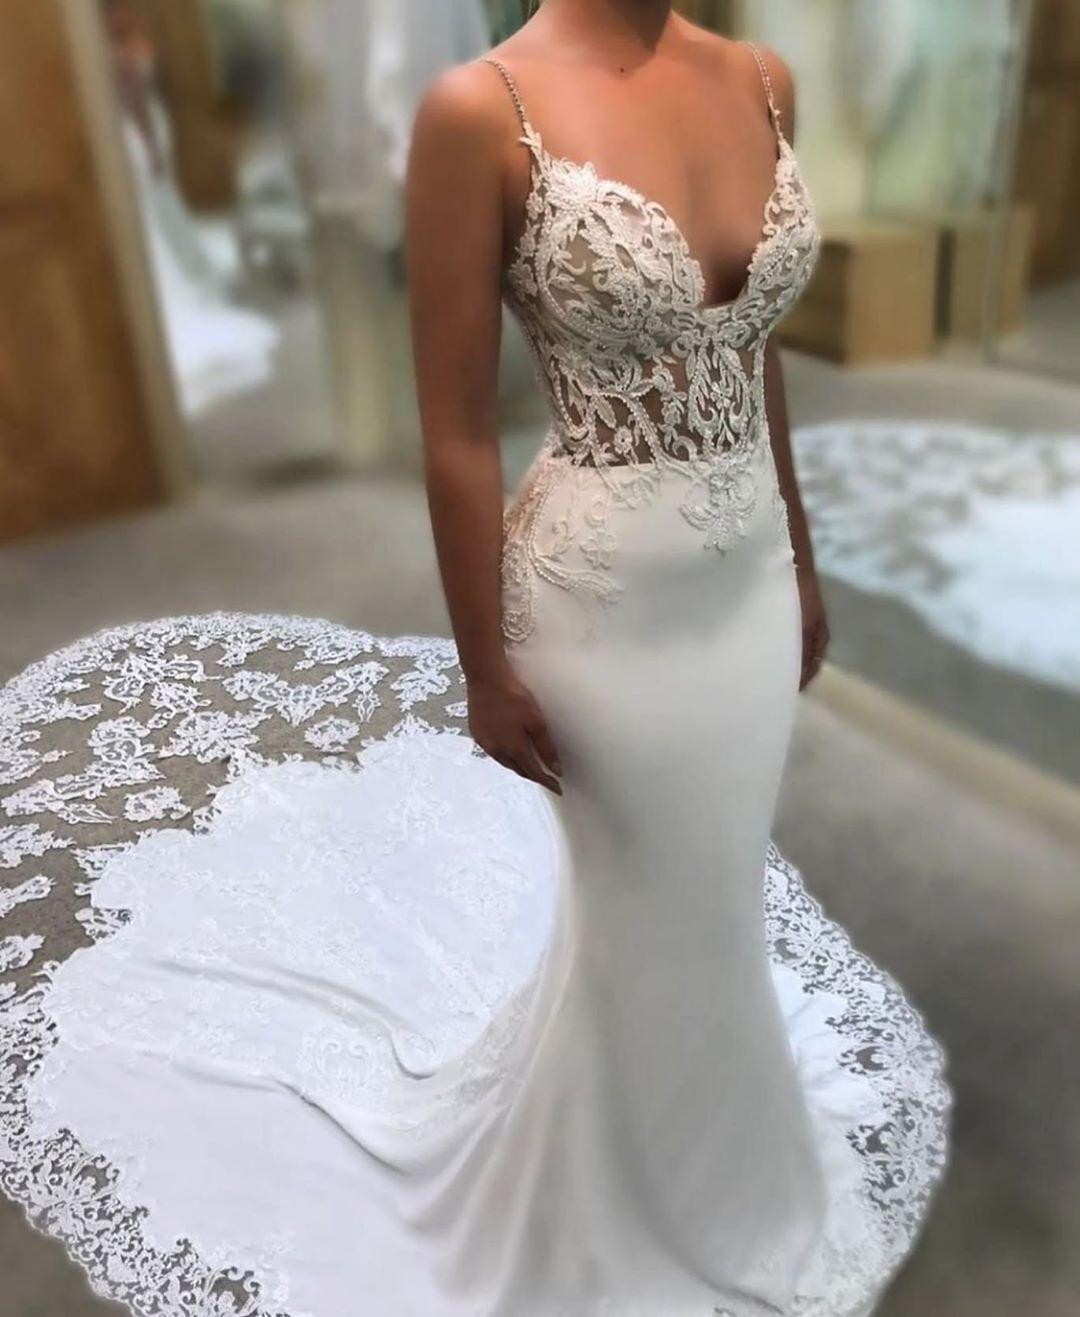 Silk Wedding Dresses Silk Evening Wear Silk Ball Gowns Applique Wedding Dress White Wedding Dresses Wedding Dresses Lace [ 1317 x 1080 Pixel ]